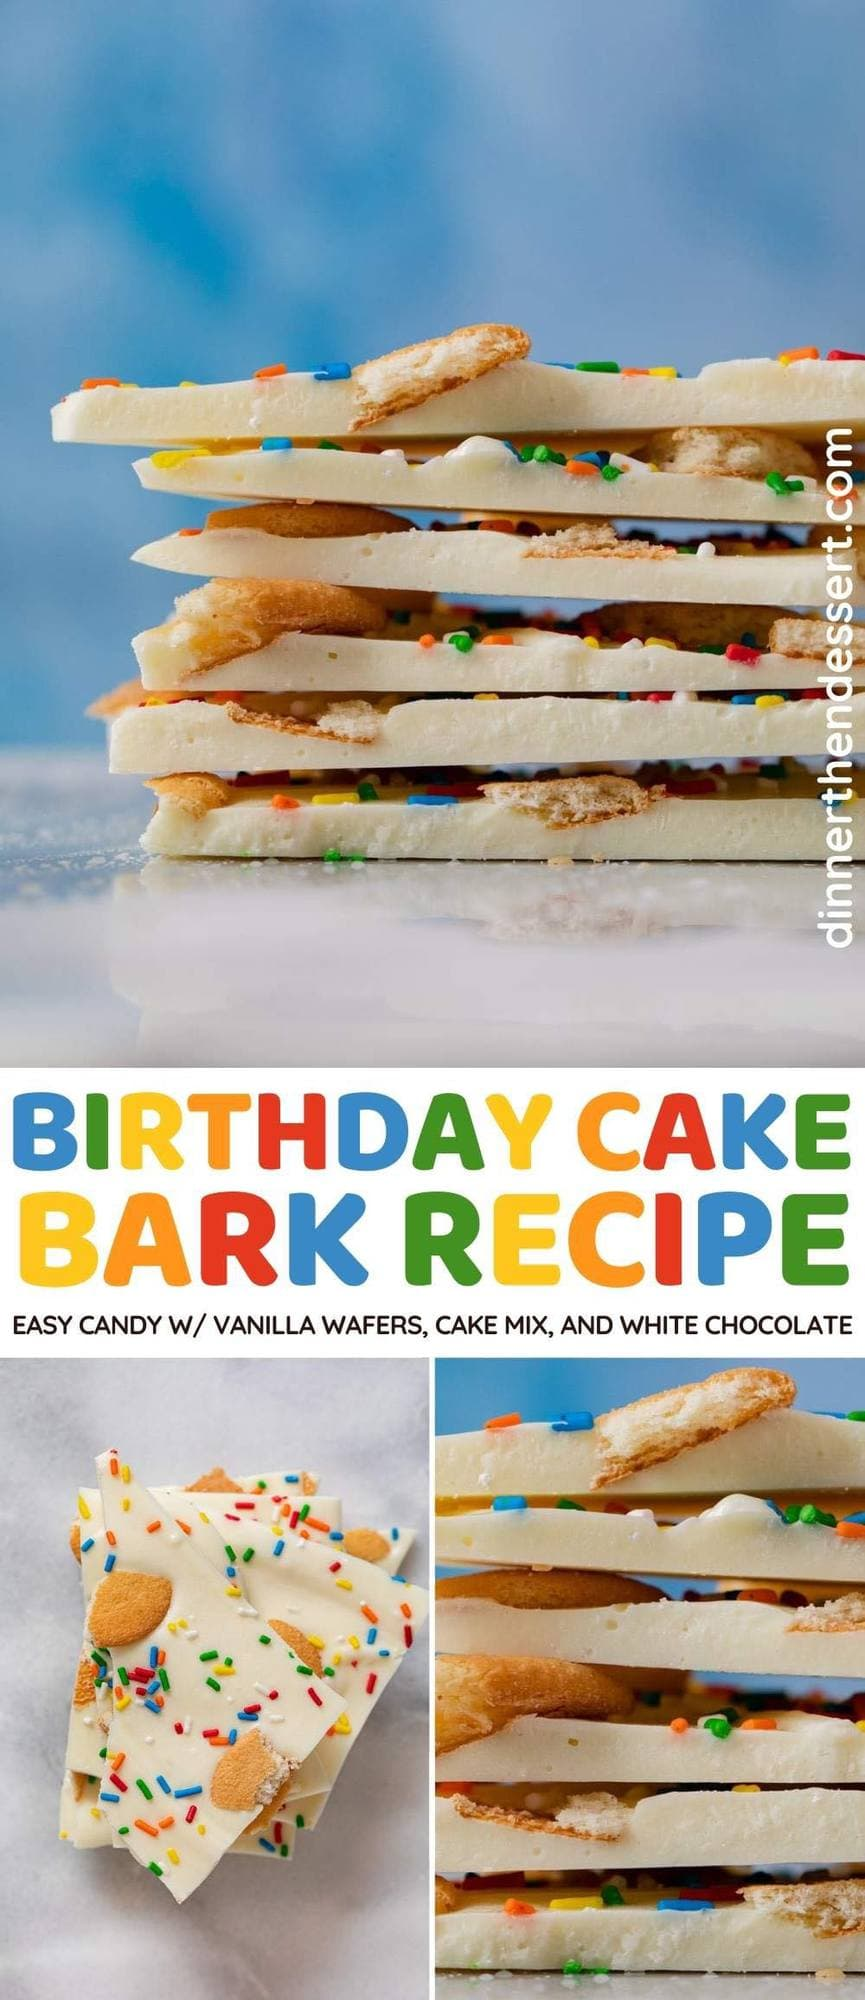 Birthday Cake Bark collage